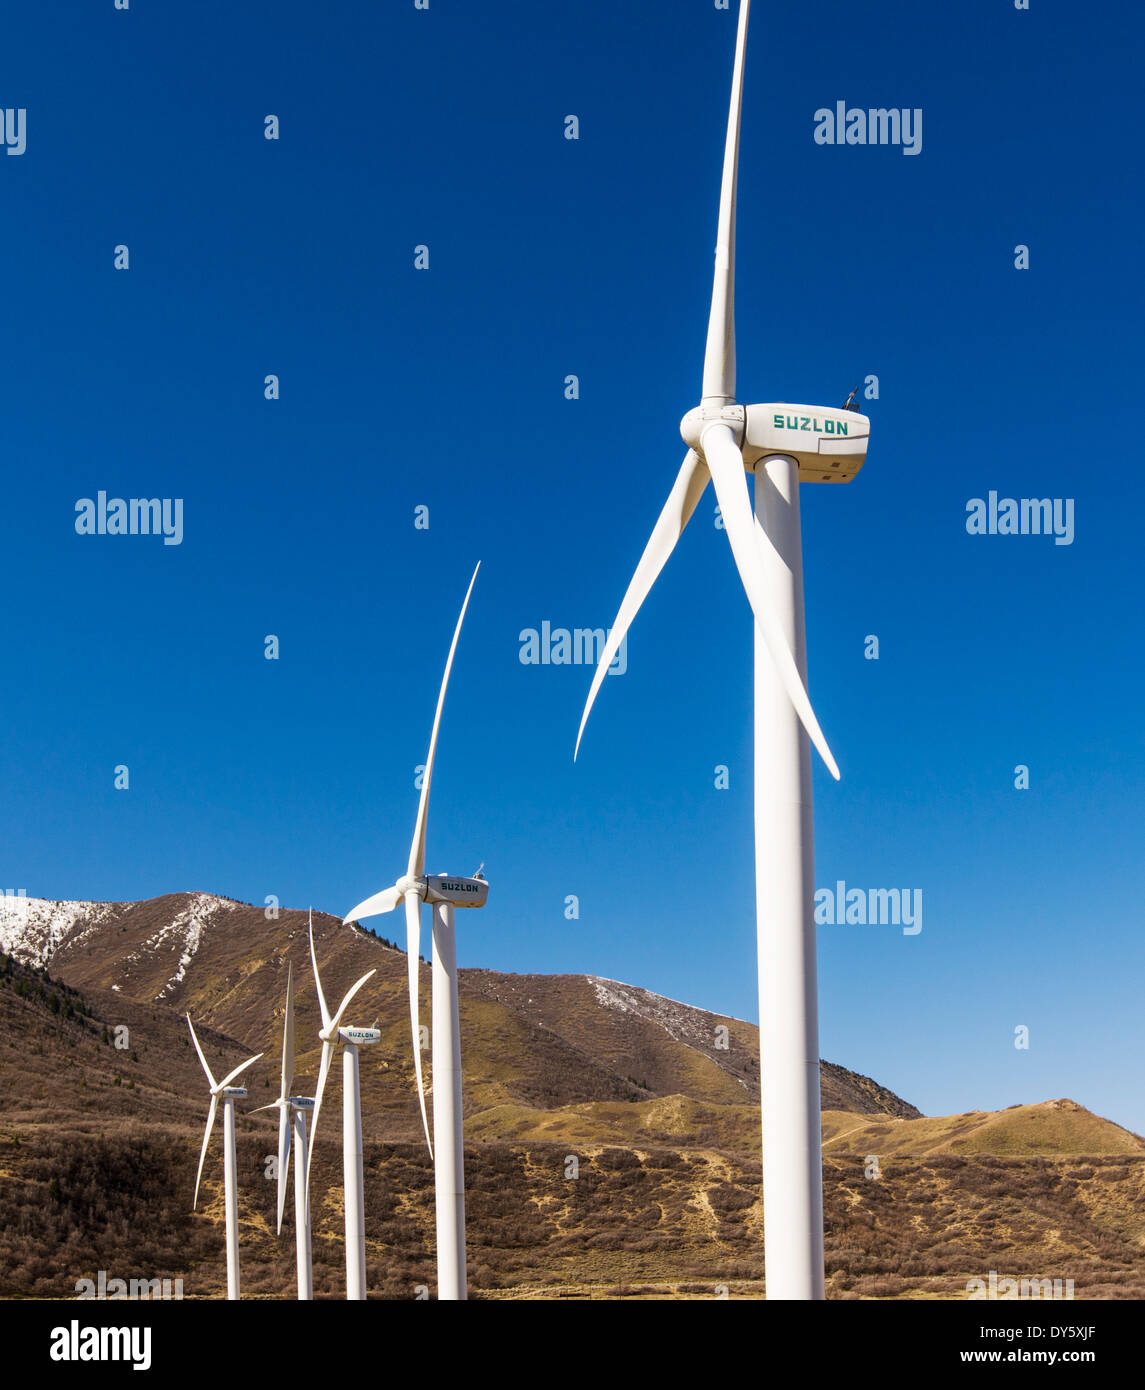 Wind turbines used to generate electricity, Spanish Fork, Utah, USA - Stock Image